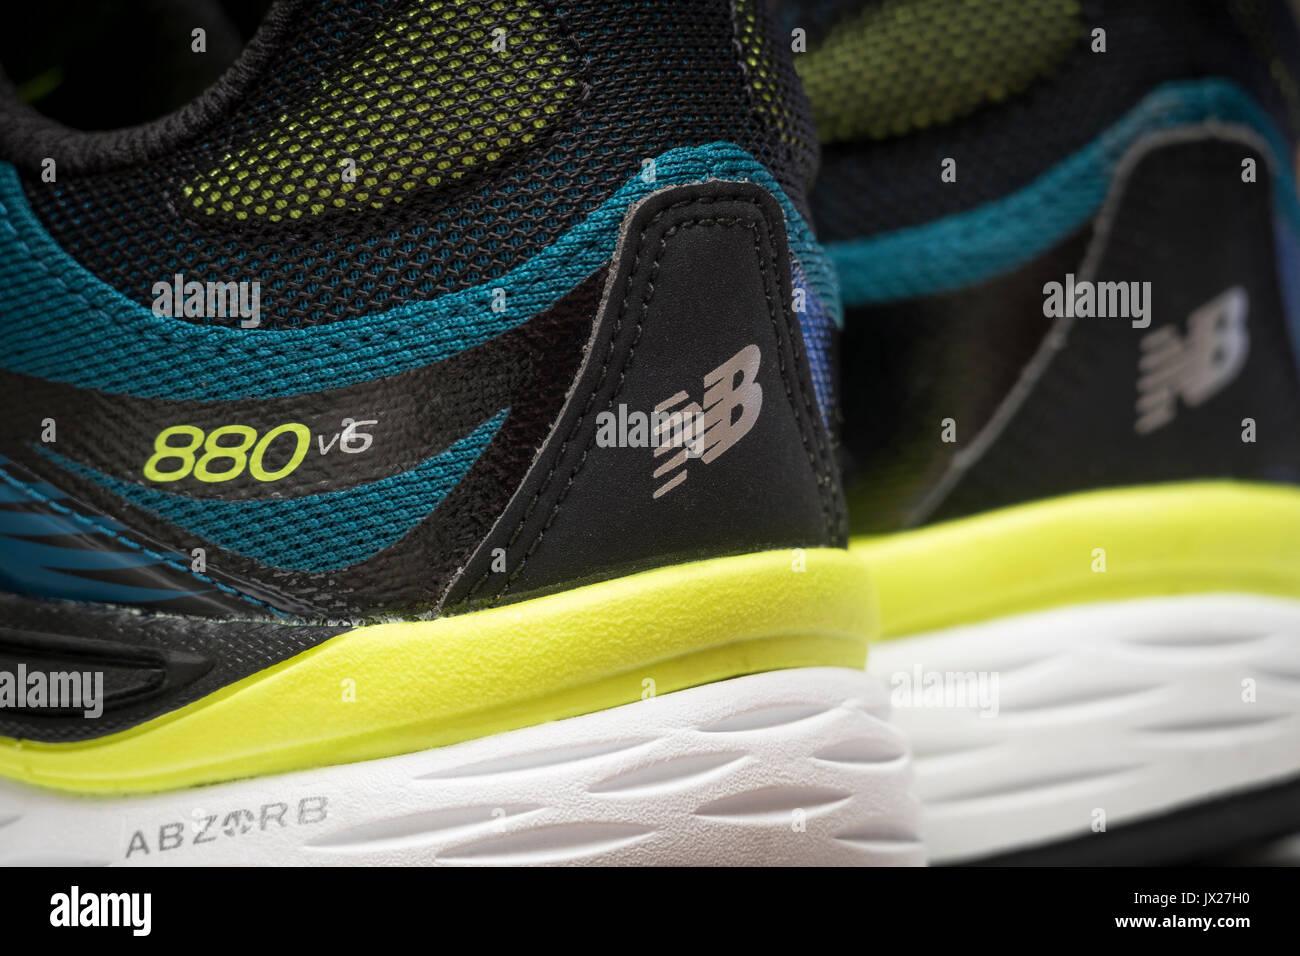 New Balance 880 v6 zapatillas, acercamiento trasero Imagen De Stock